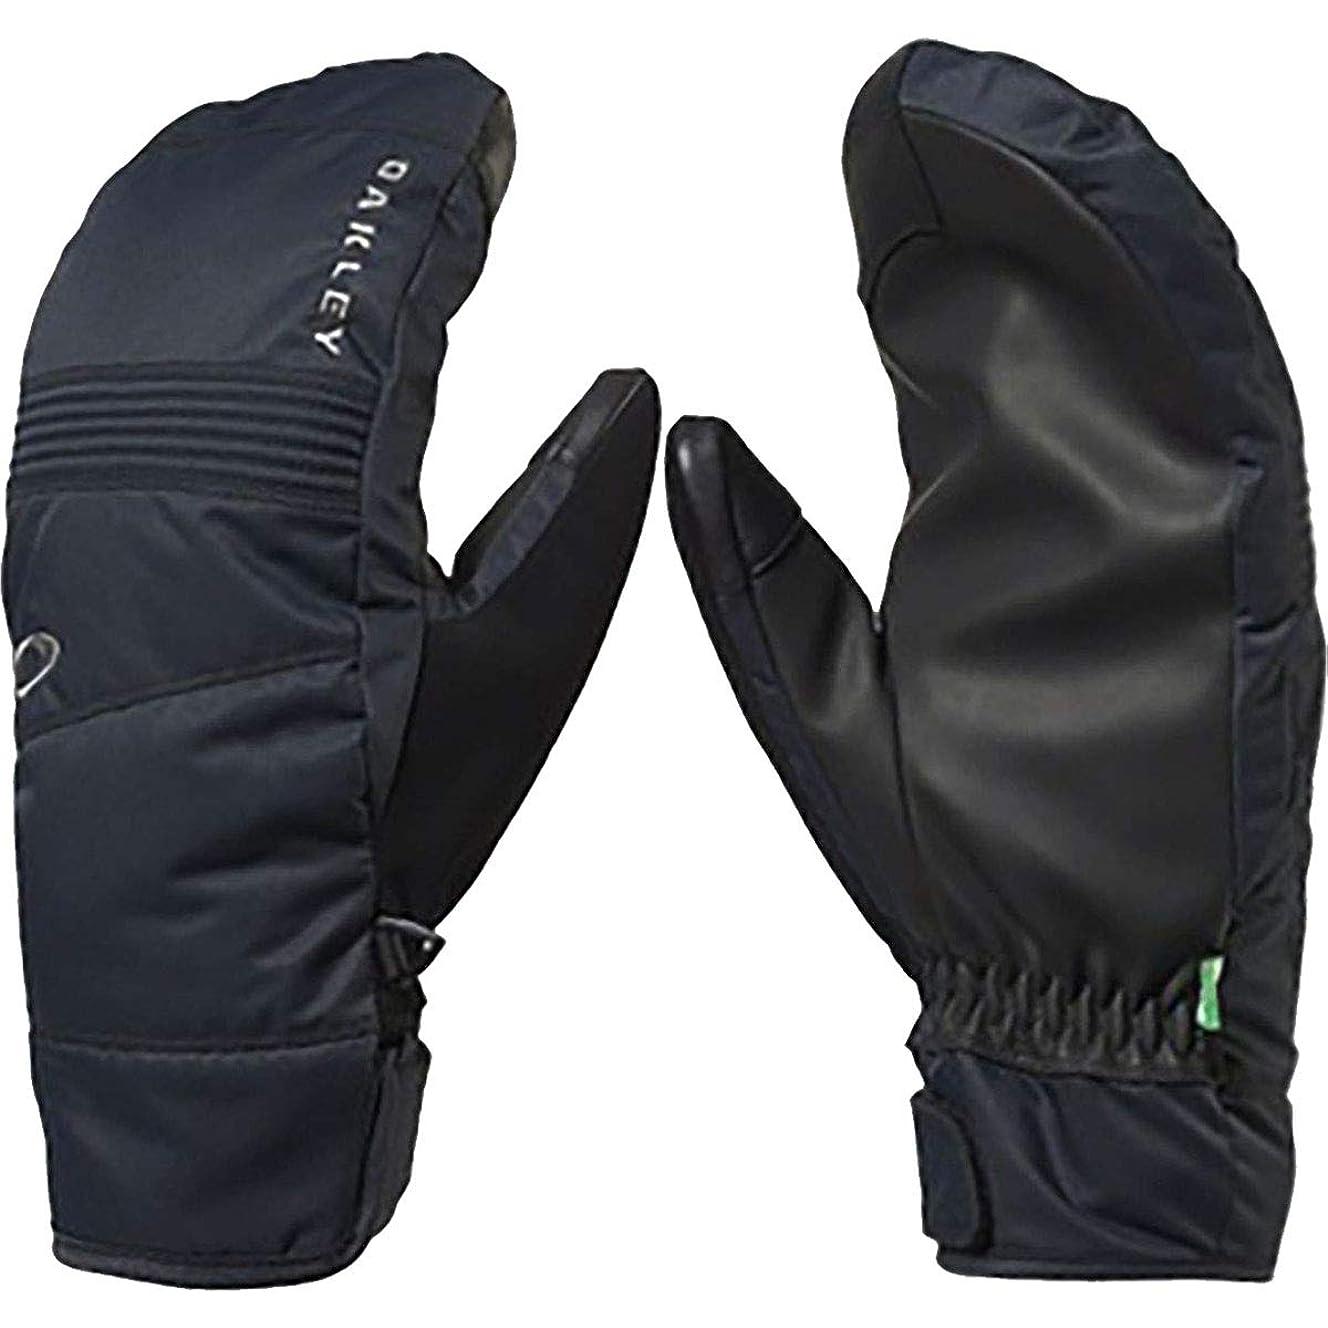 Oakley Roundhouse 2.5 Men's Snowboarding Mitten Gloves - Blackout/Large